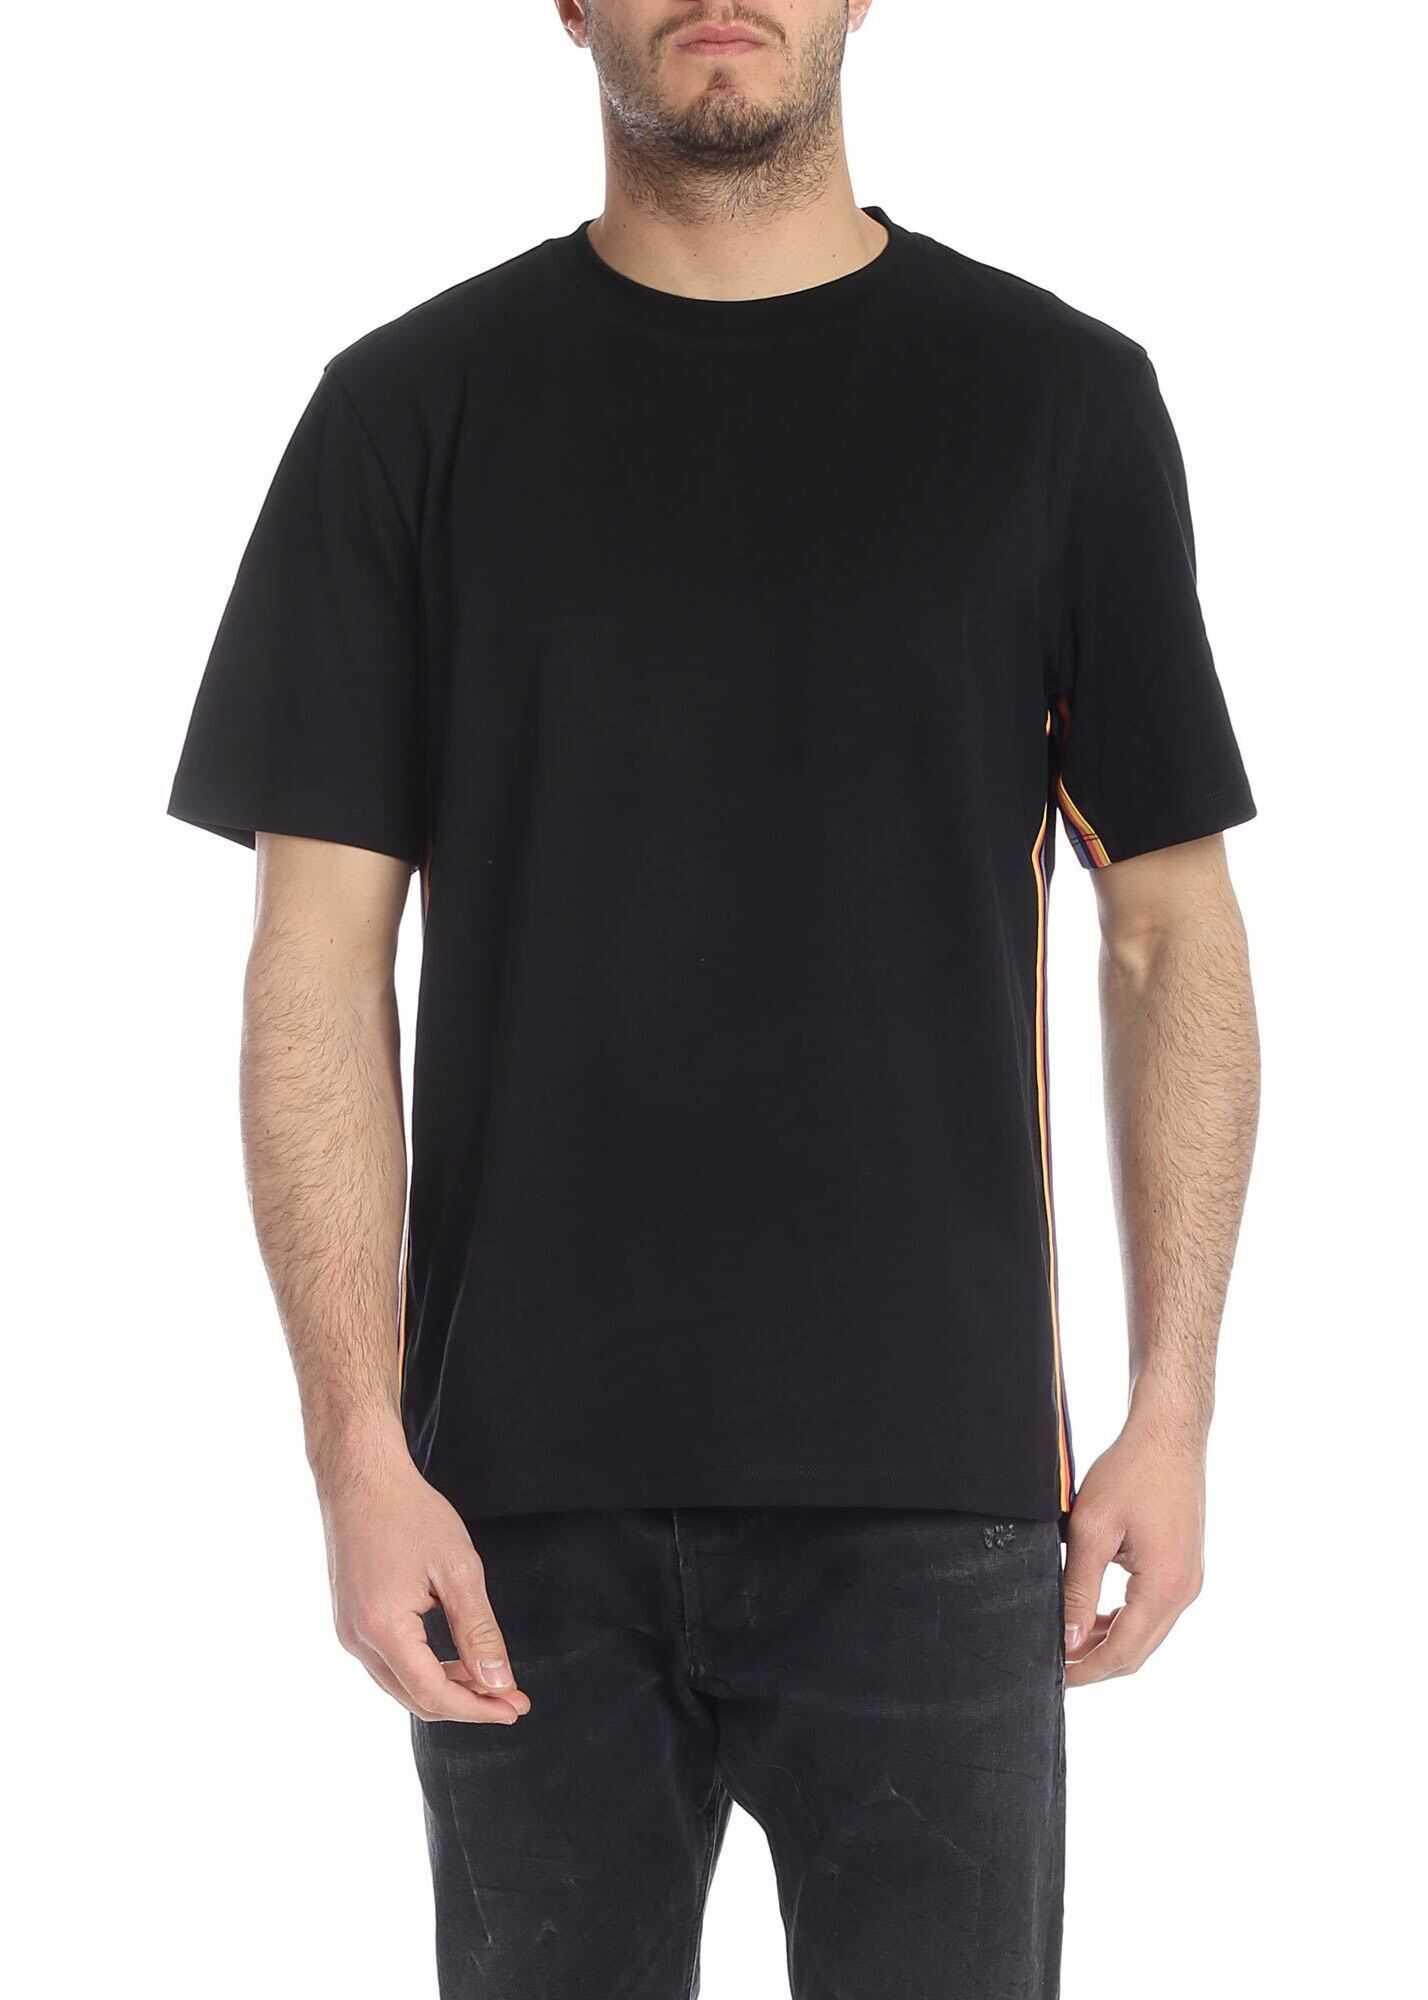 Paul Smith Artist Stripe T-Shirt In Black Black